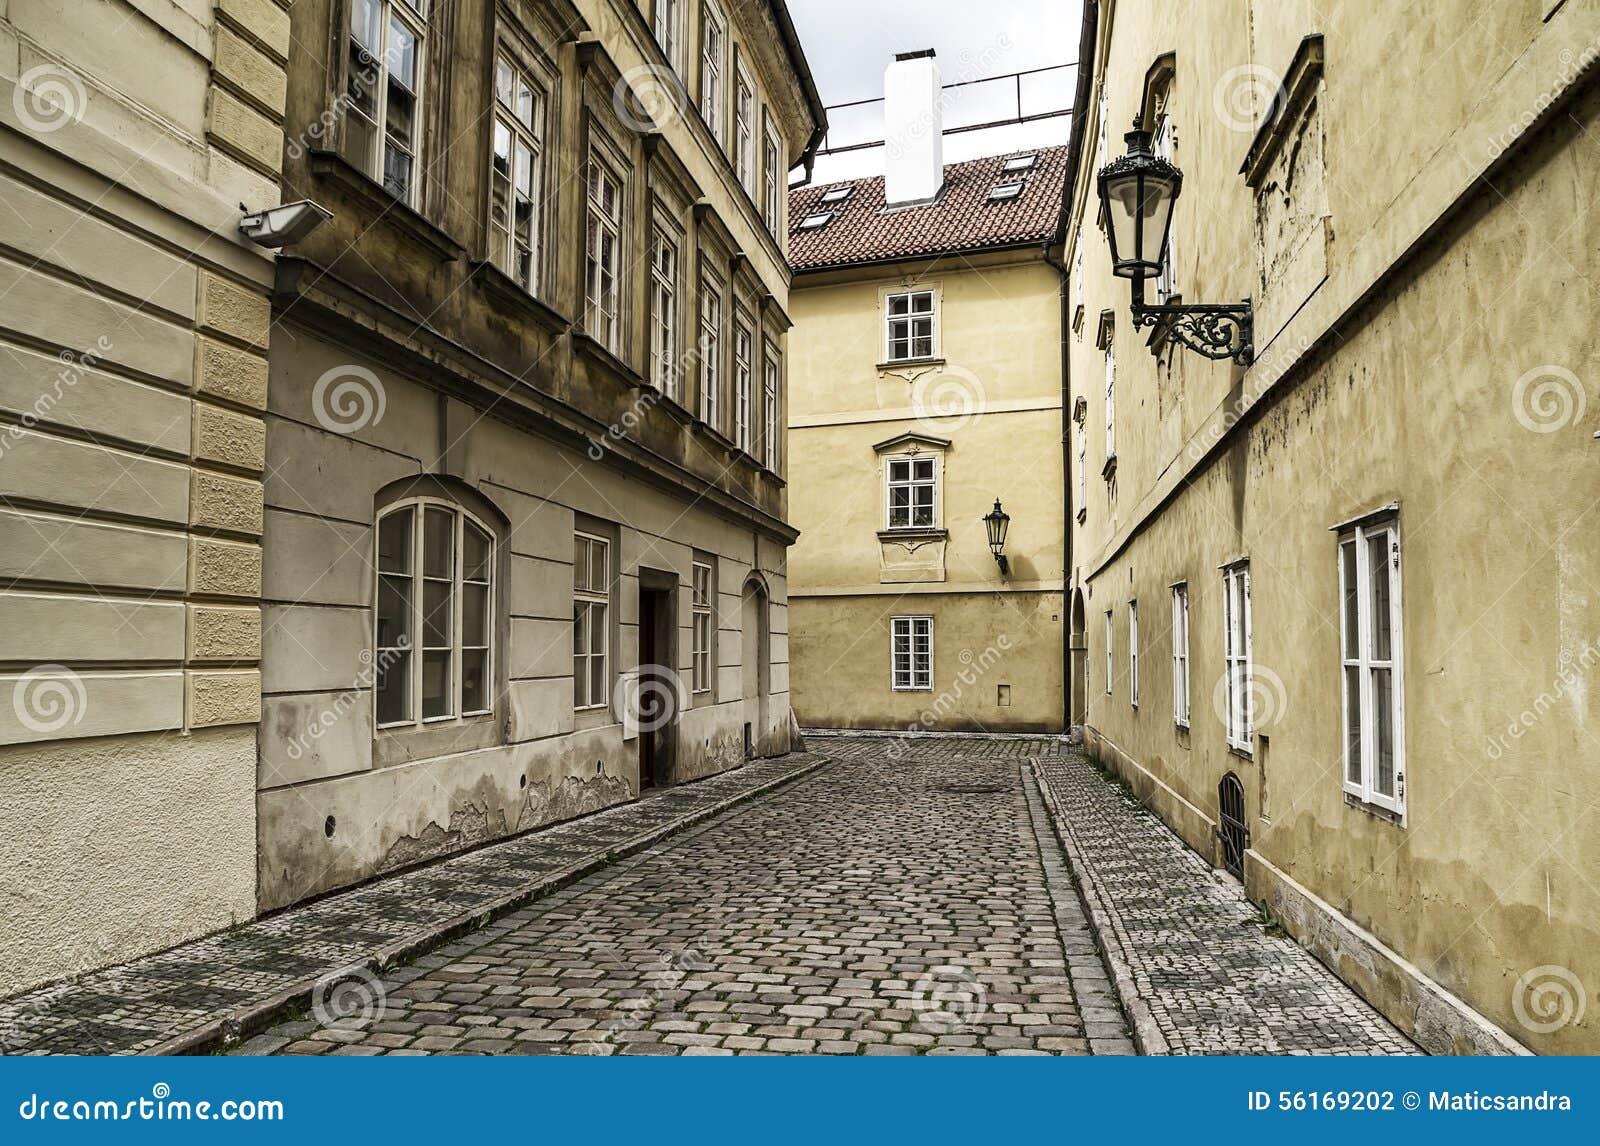 Чешский пикап на улице праги фото 231-275